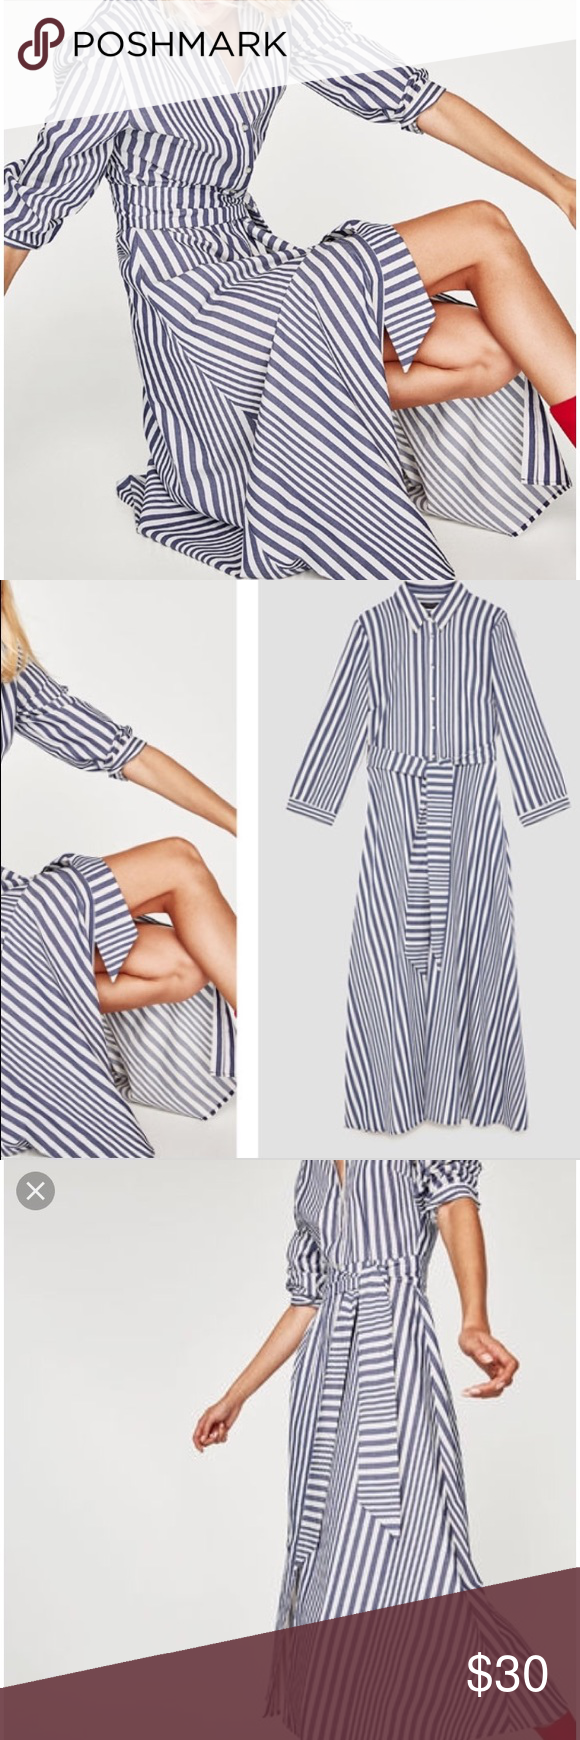 b3b0de13 Zara Blue White Striped Shirt Dress Long Sleeve M Zara Woman Blue and white  vertical striped